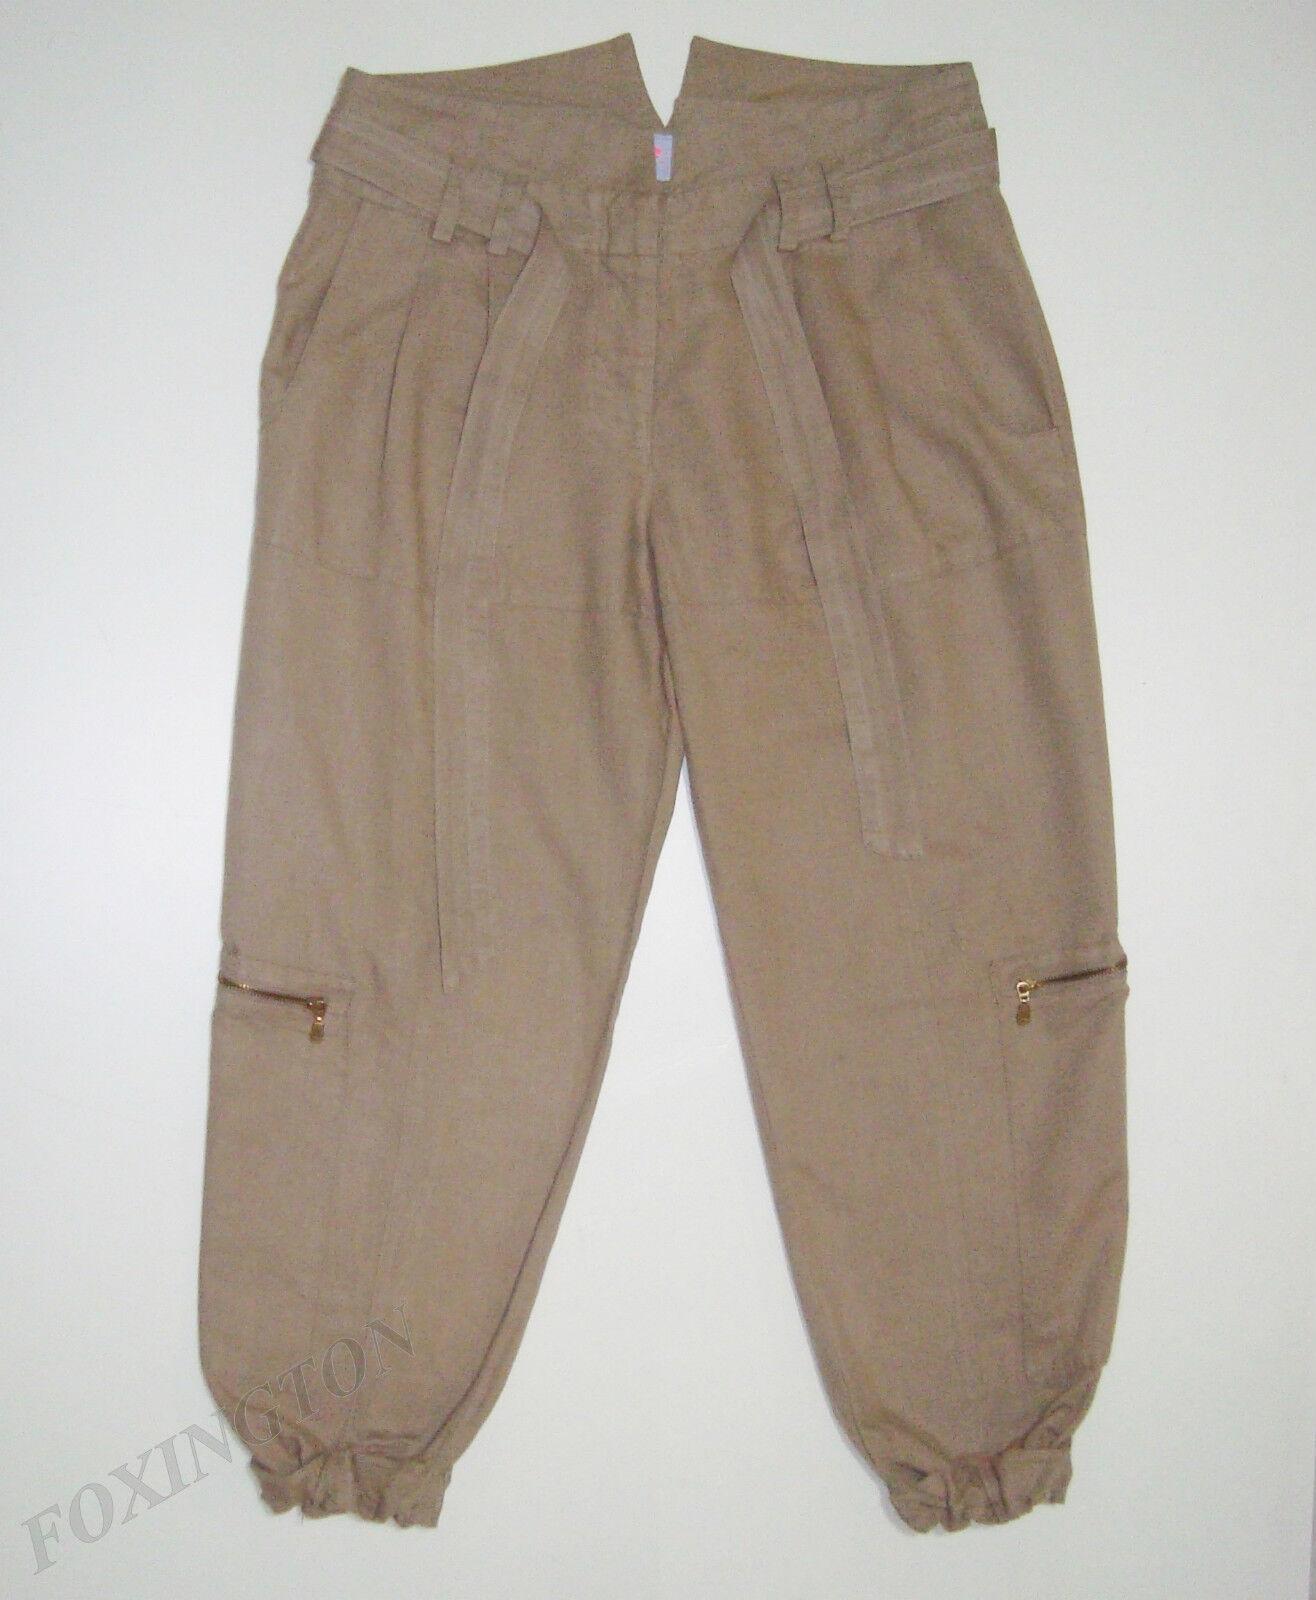 SASS&BIDE LOOSE FITTING CROPPED PANTS 38 2 AUS 10  WIND RUNNER PAPER BAG PANT